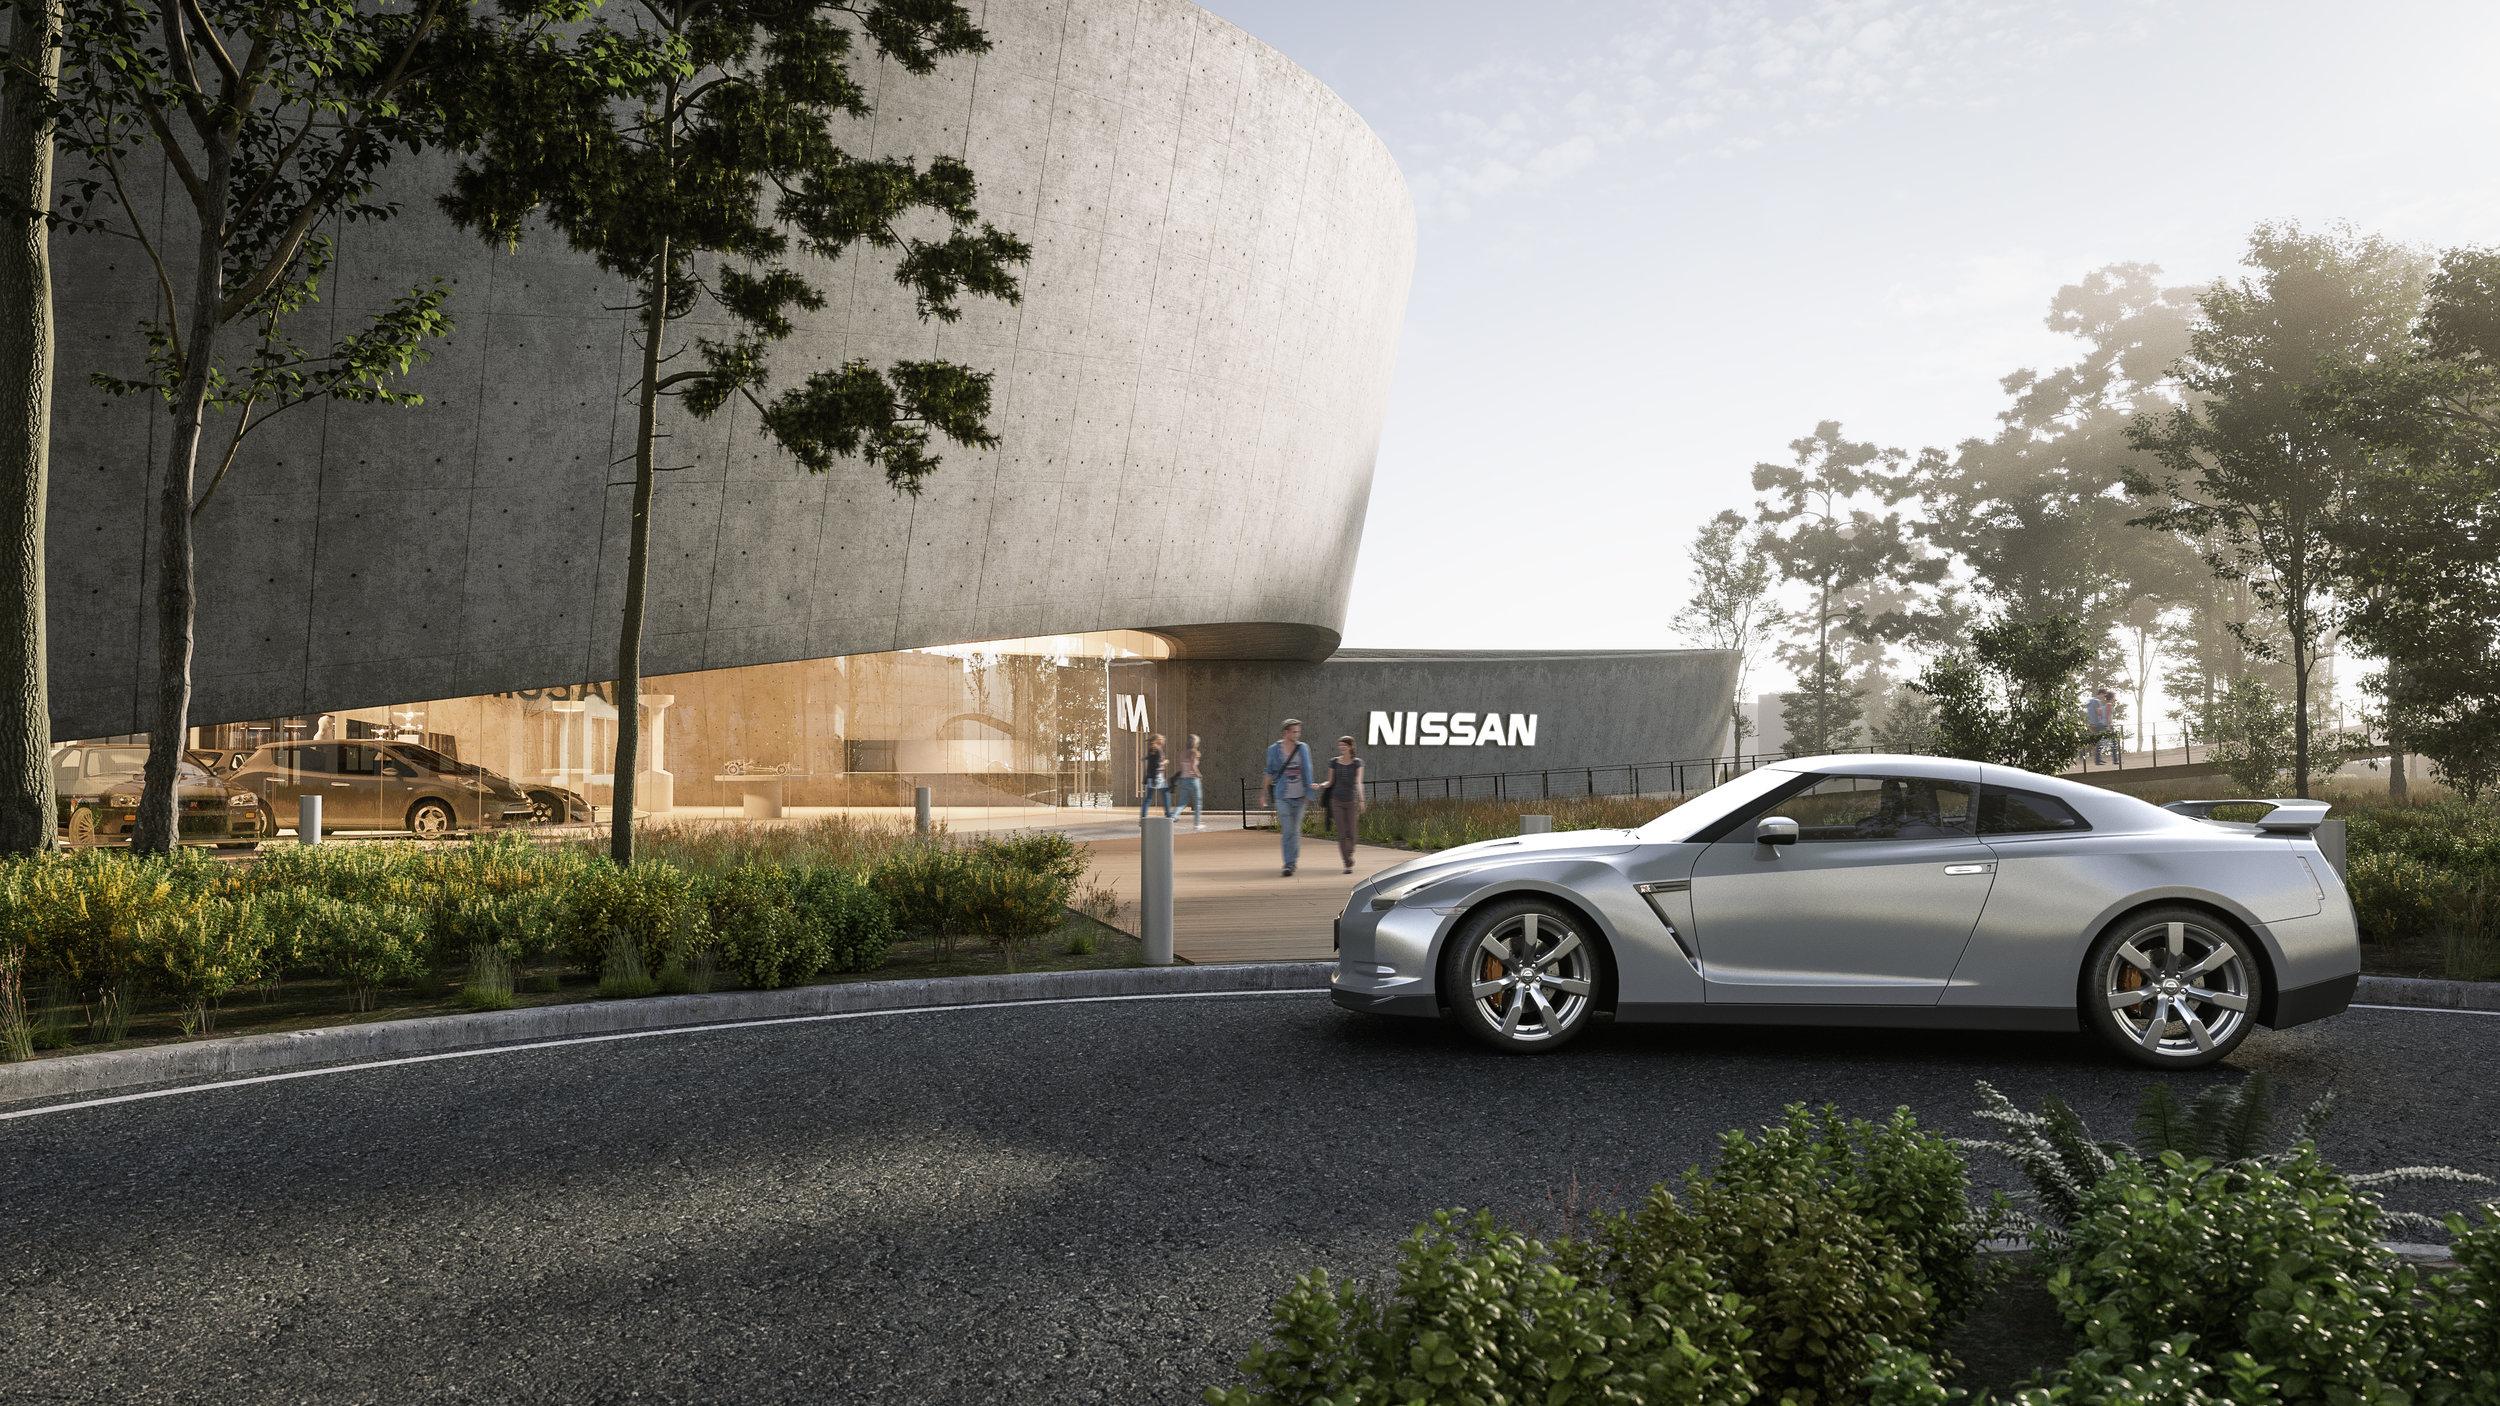 Nissan Heritage Museum, Yokohama, Japan